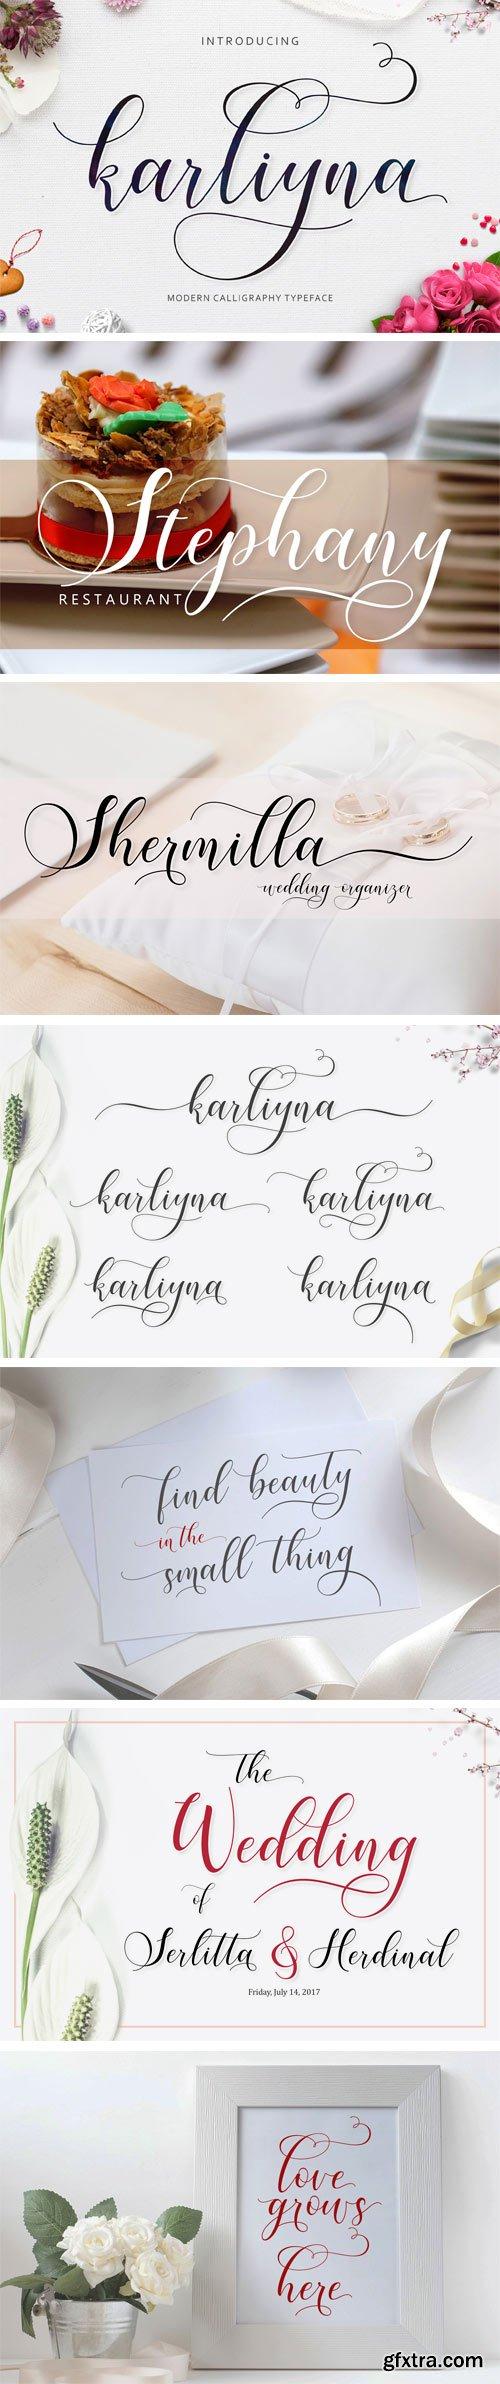 Fontbundles - Karliyna Script 26768